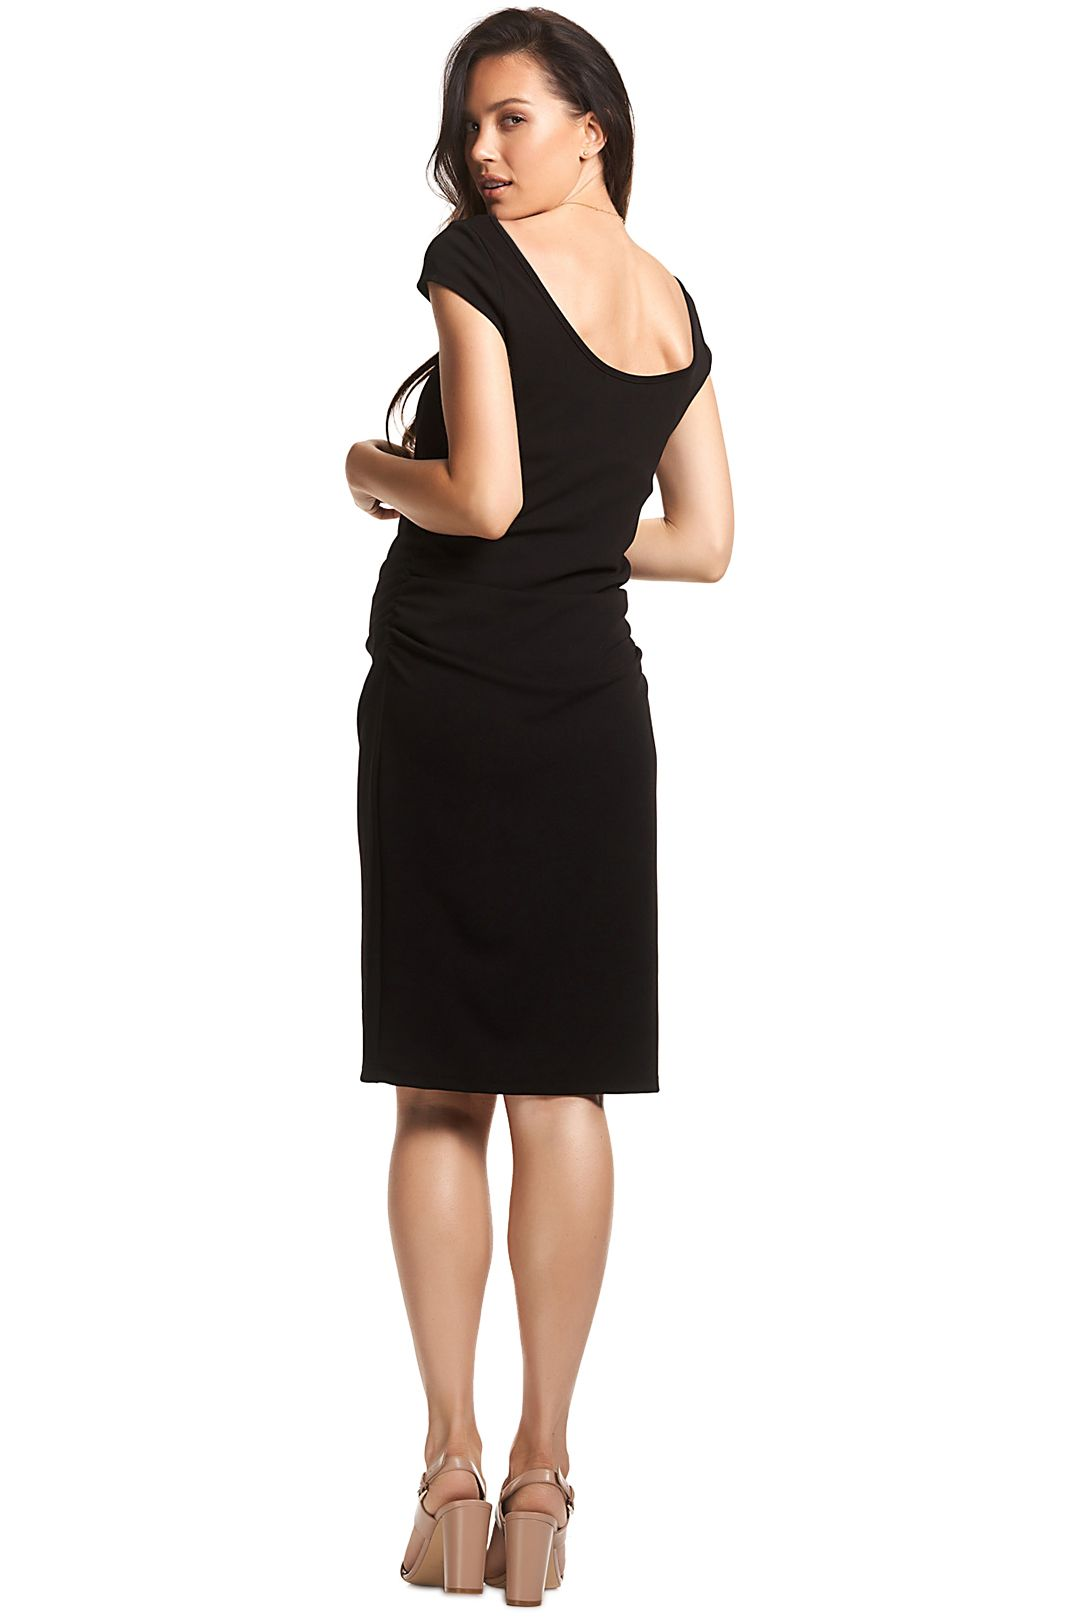 Soon-Maternity-Leo-Cap-Sleeve-Dress-Black-Back